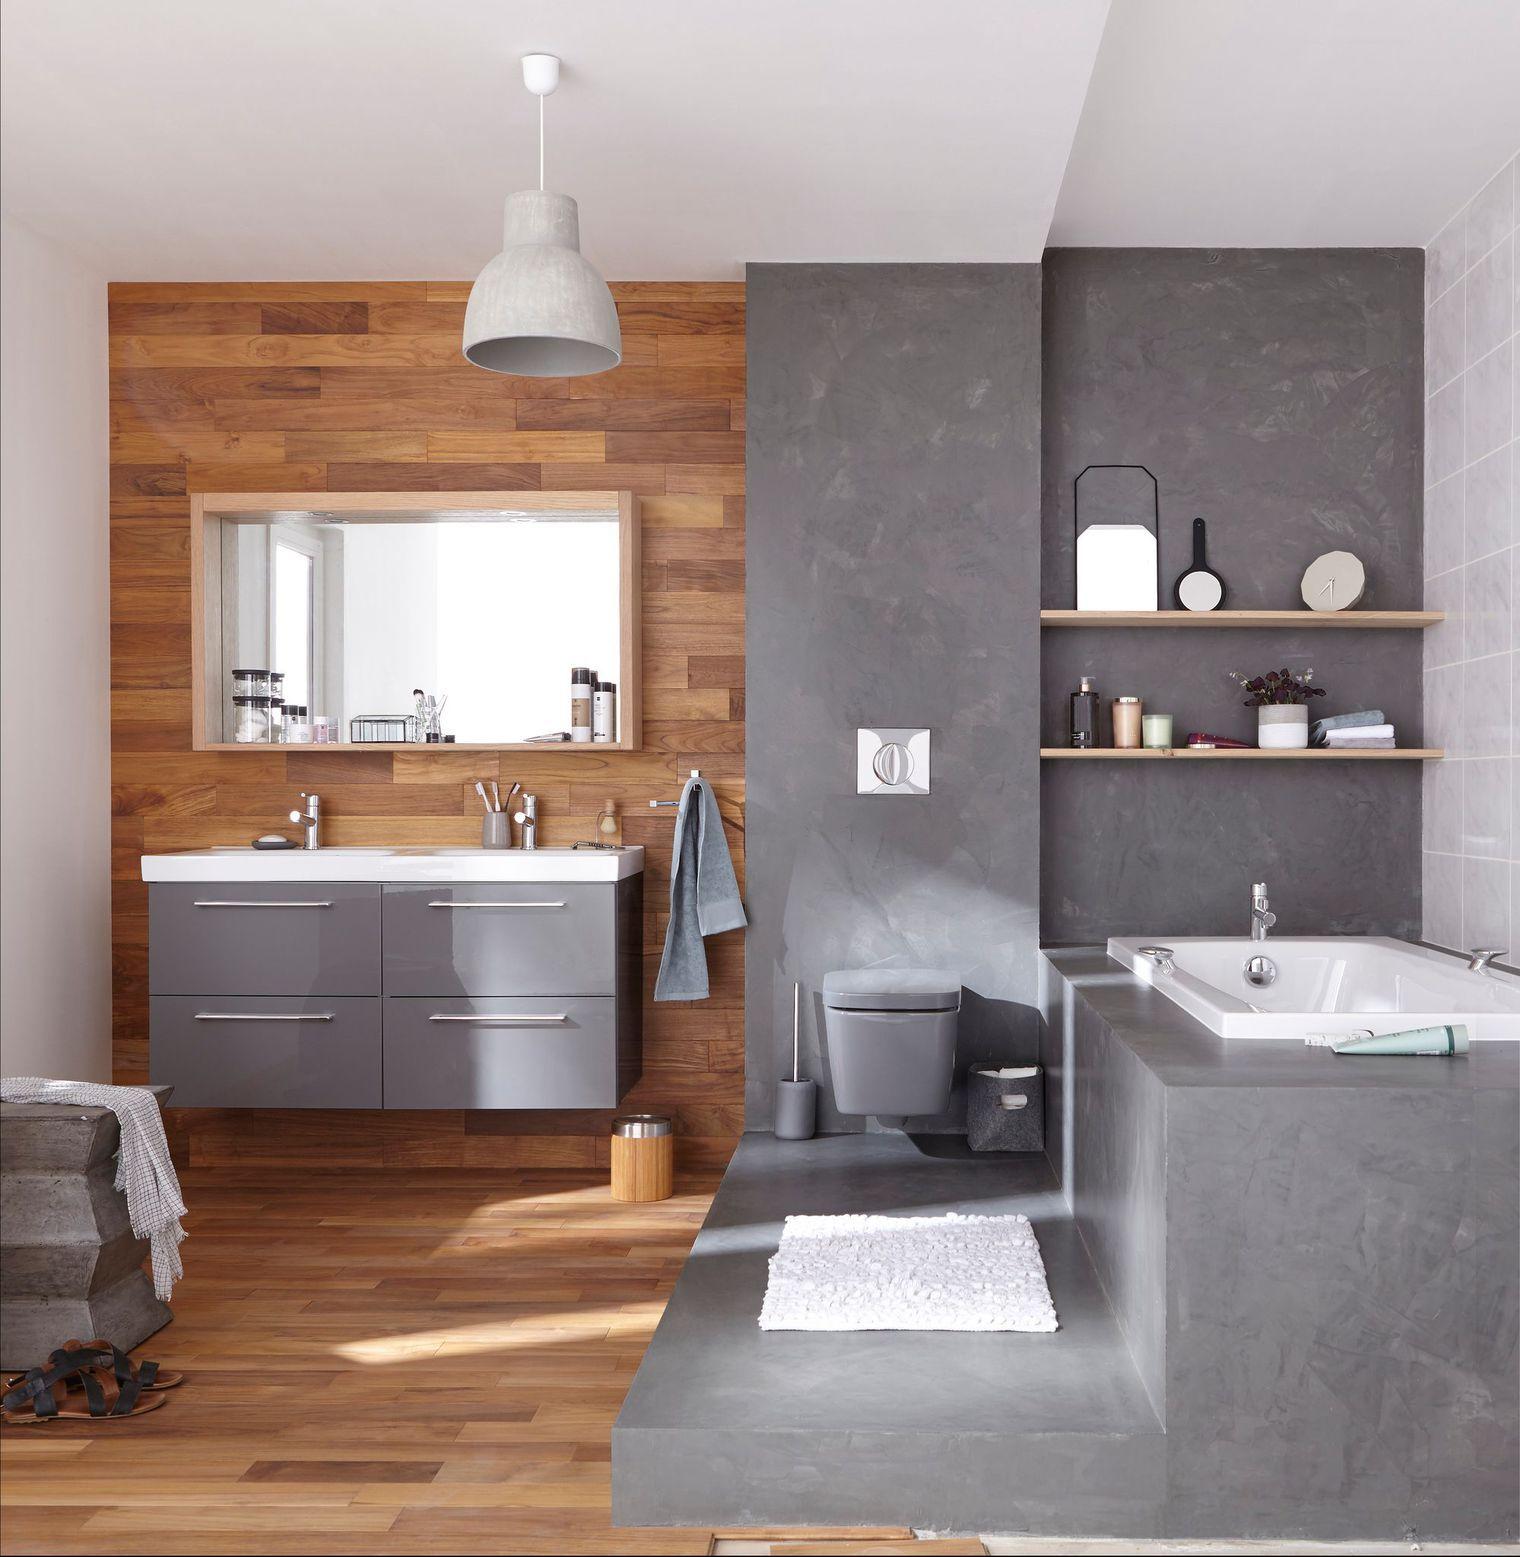 Картинки по запросу Carreaux De Ciment Salle De Bain. House IdeasInterior  DesignLeroy MerlinBath ...